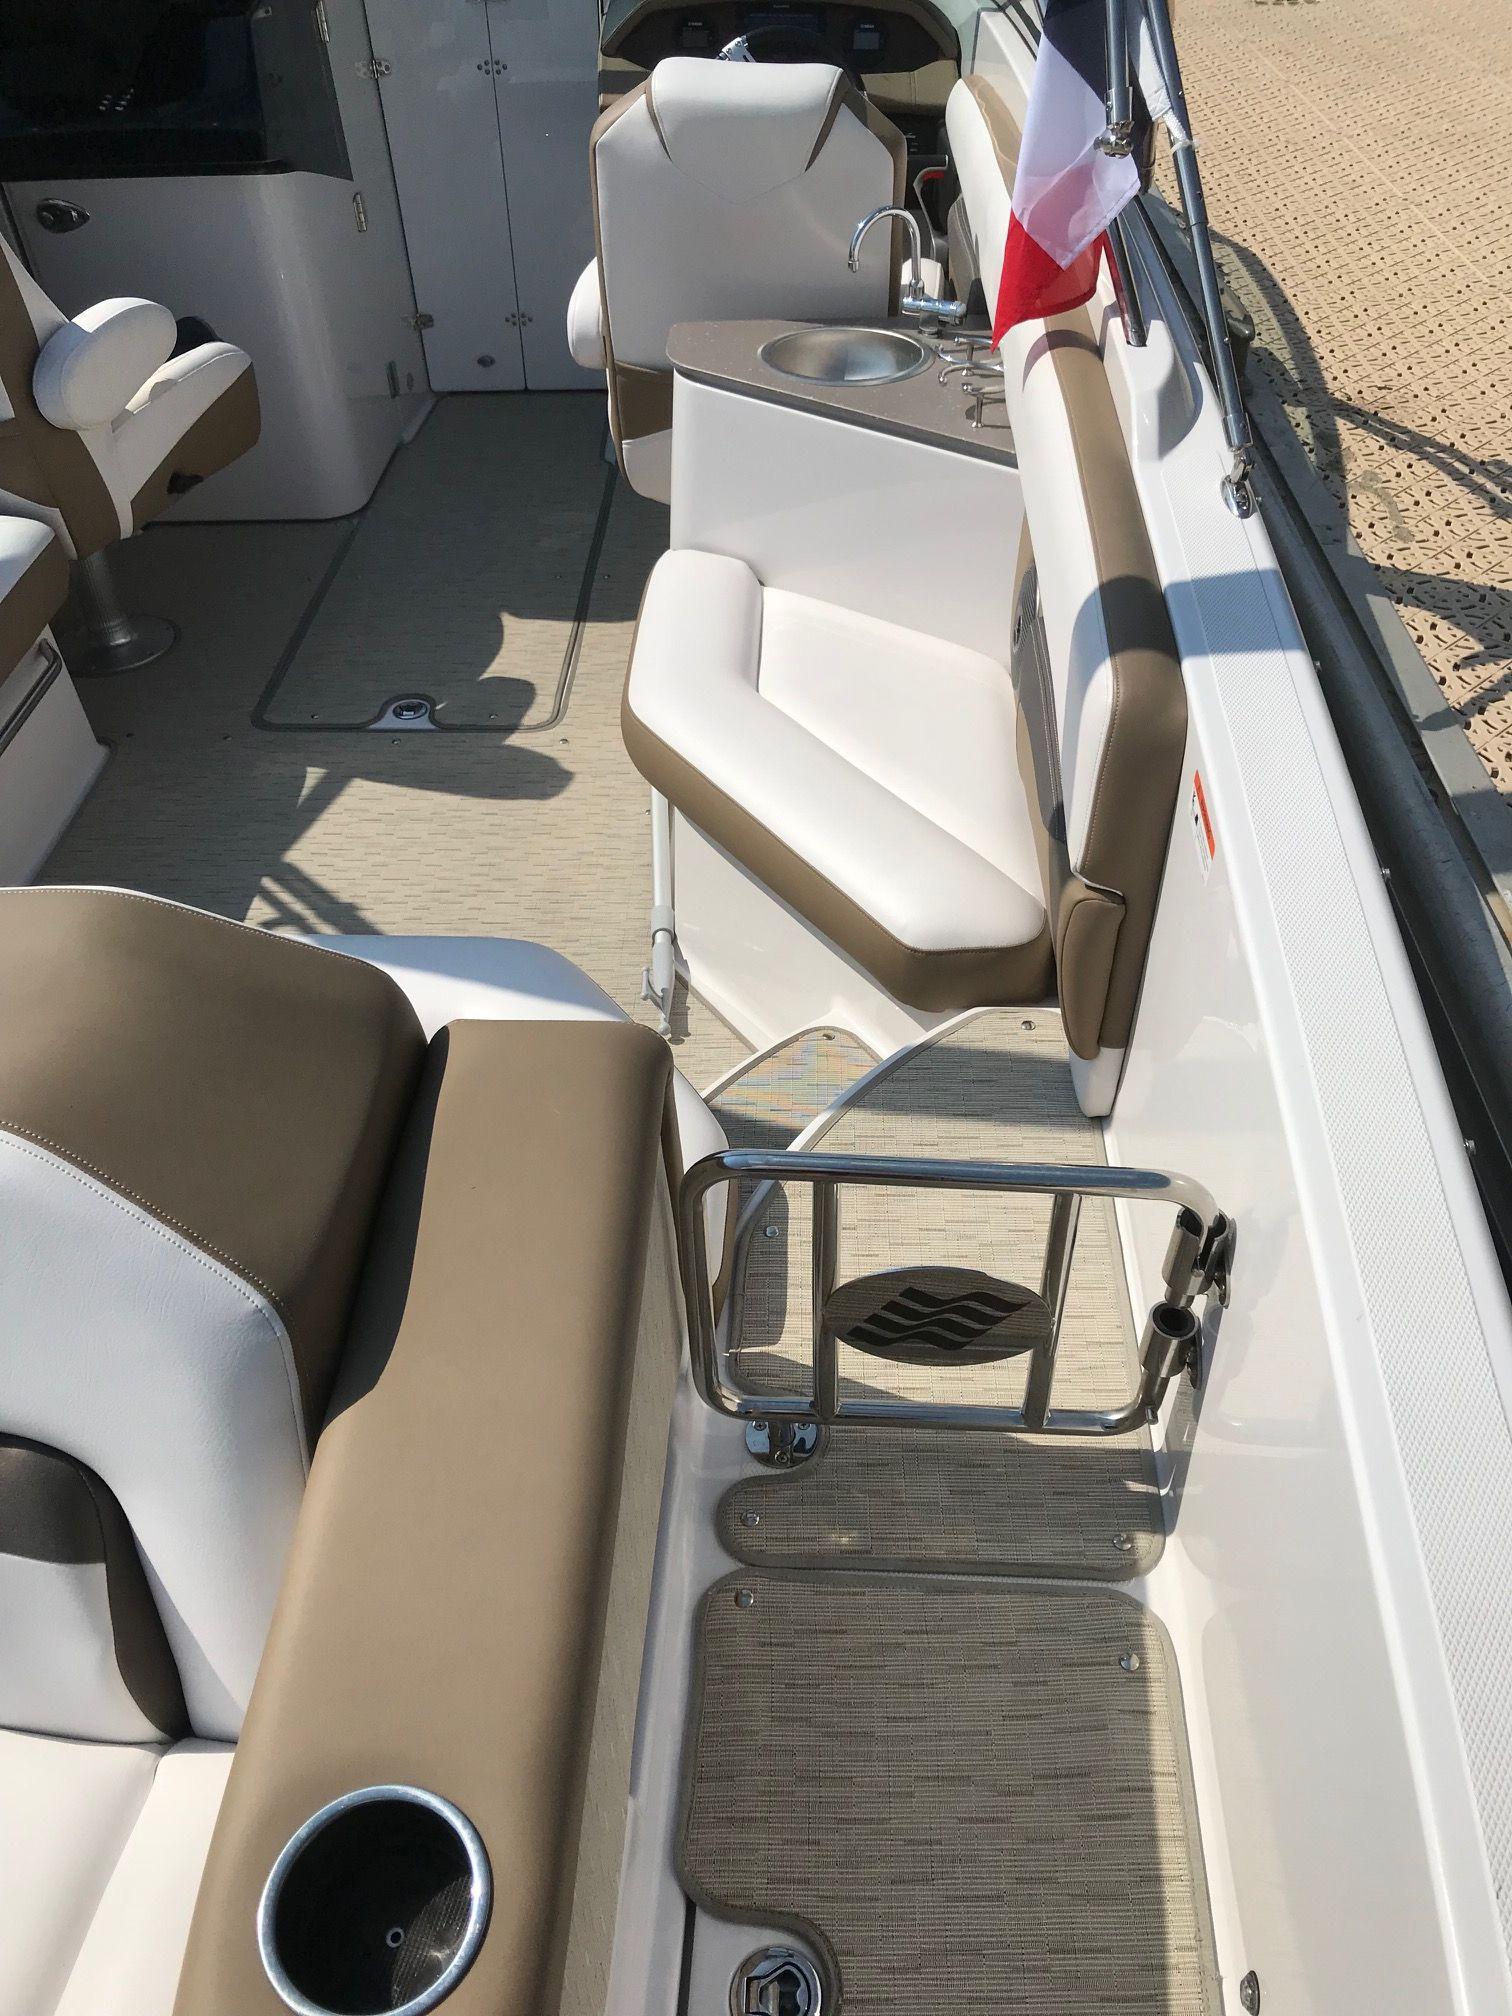 Bateau four winns hd270 luxe location la journ e furious nautisme for Location luxe